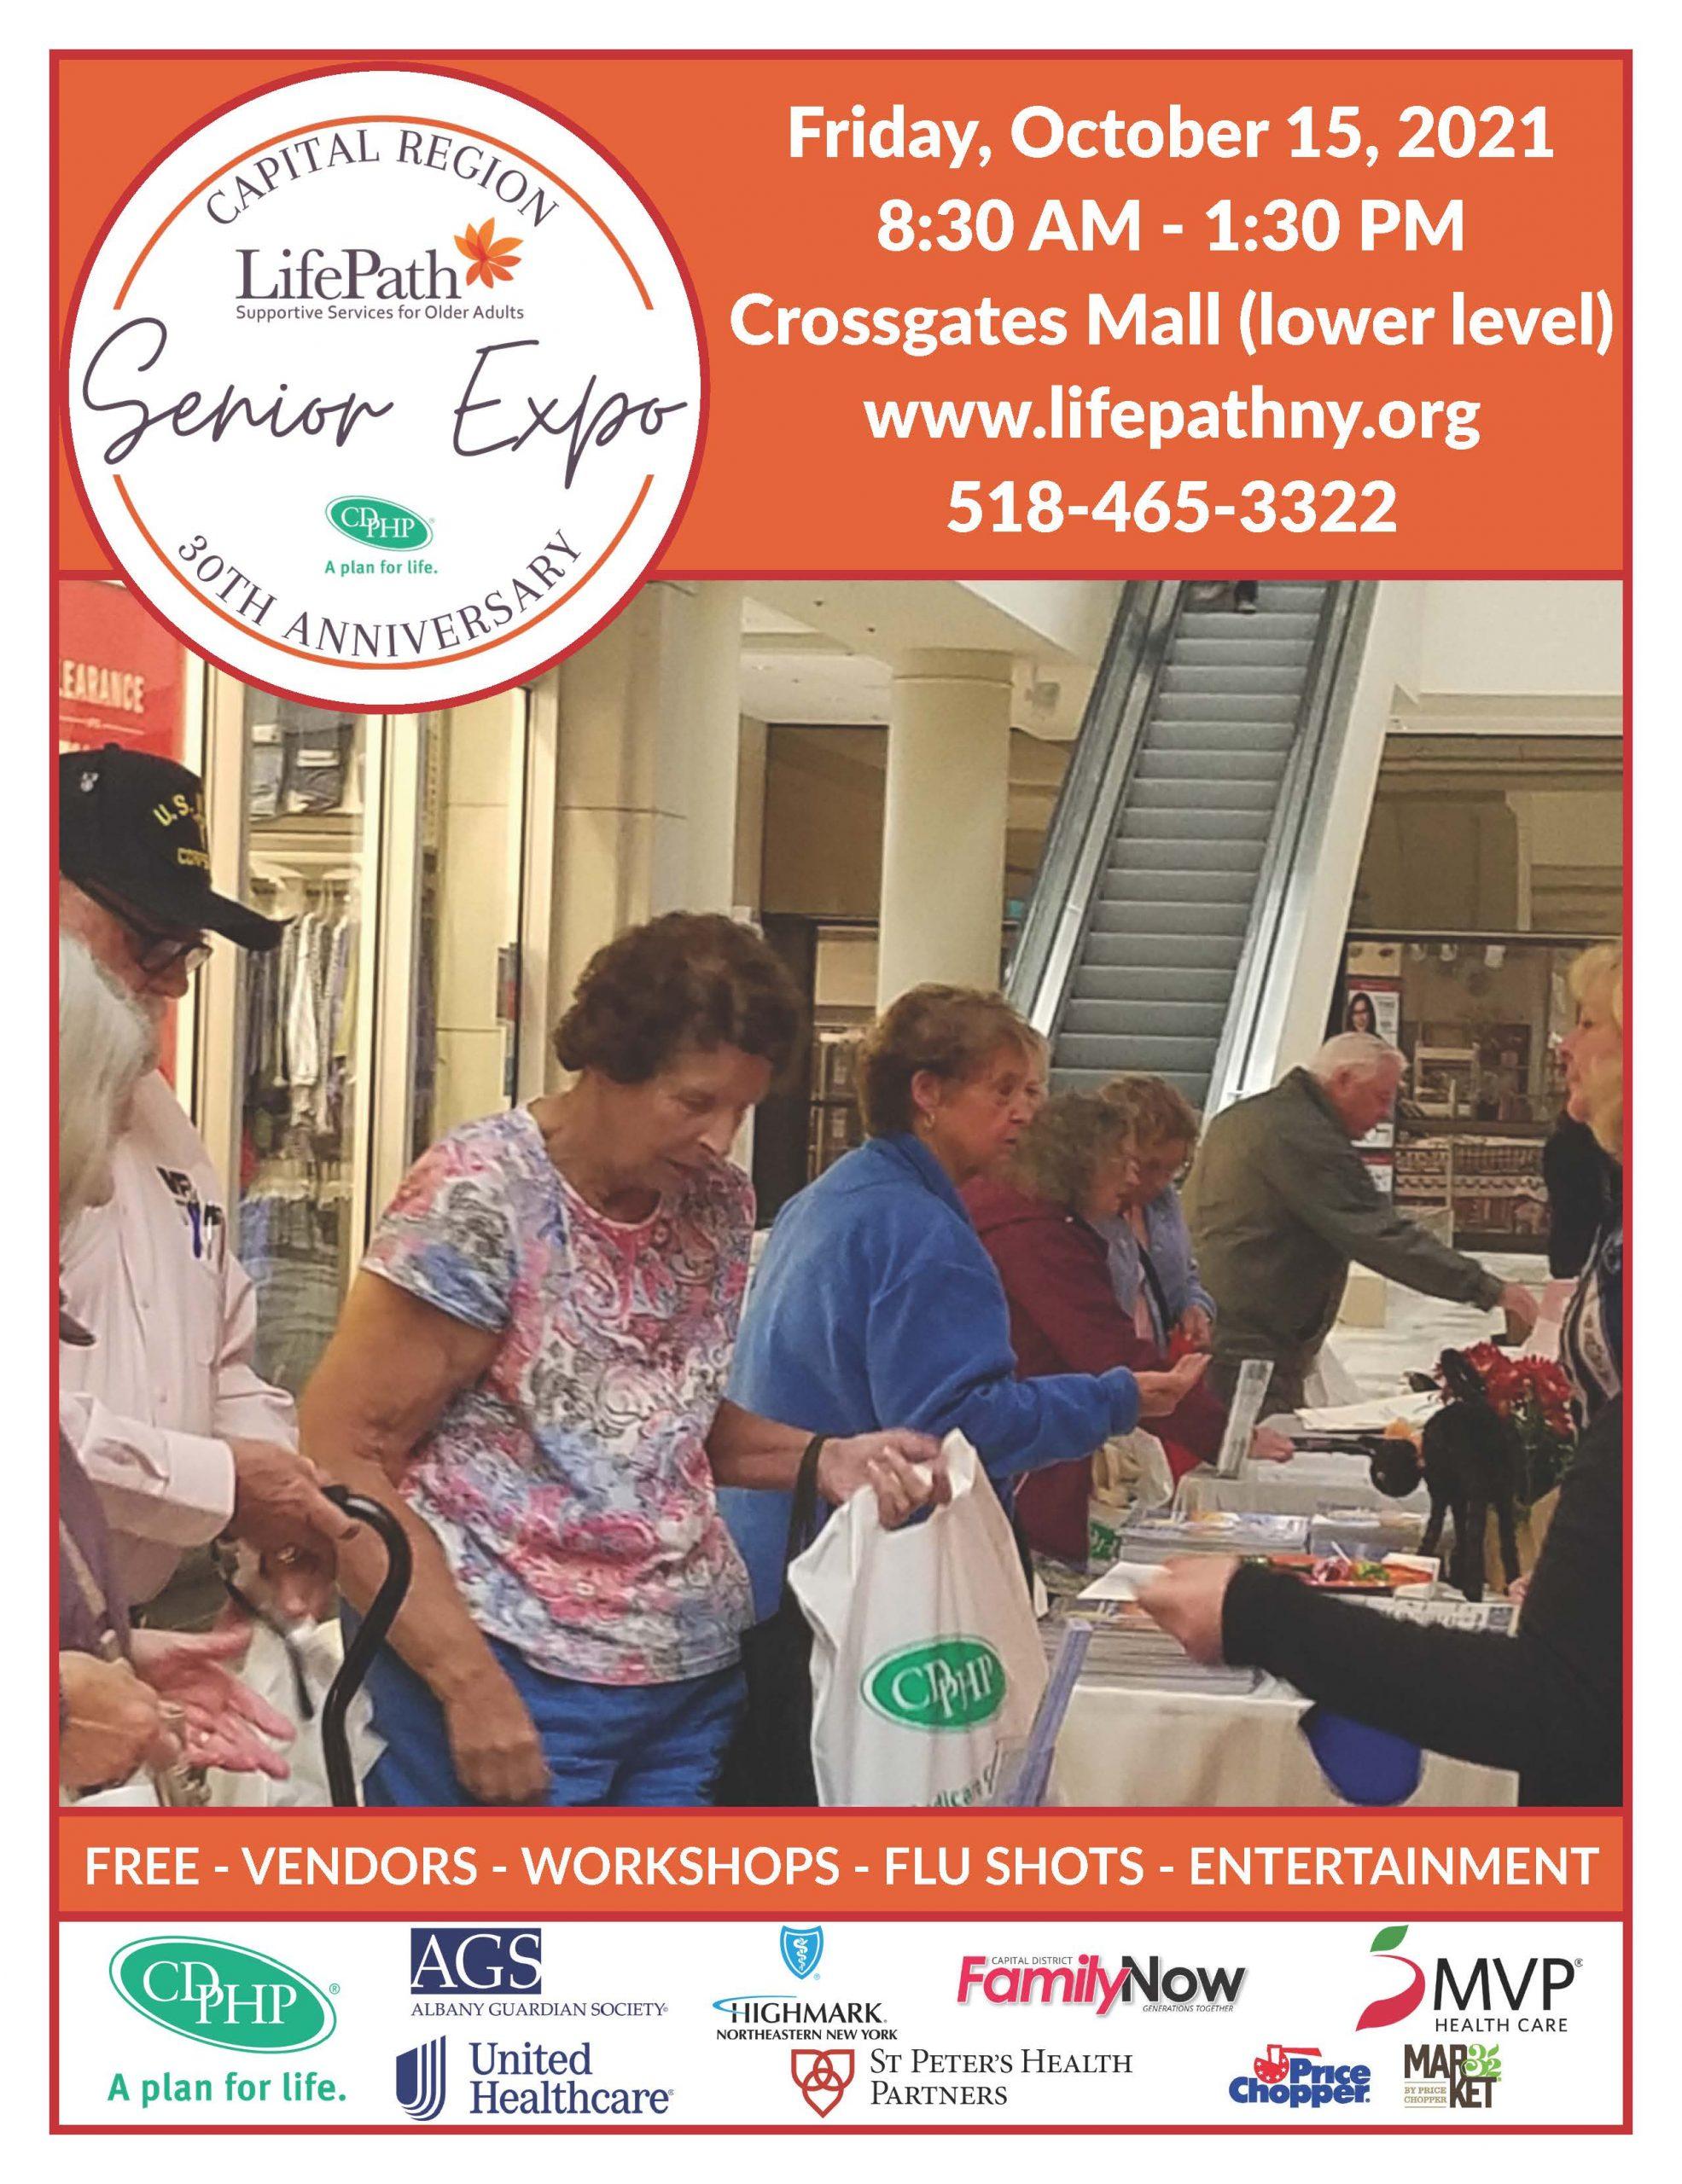 2021 Capital Region Senior Expo Crossgates Flyer